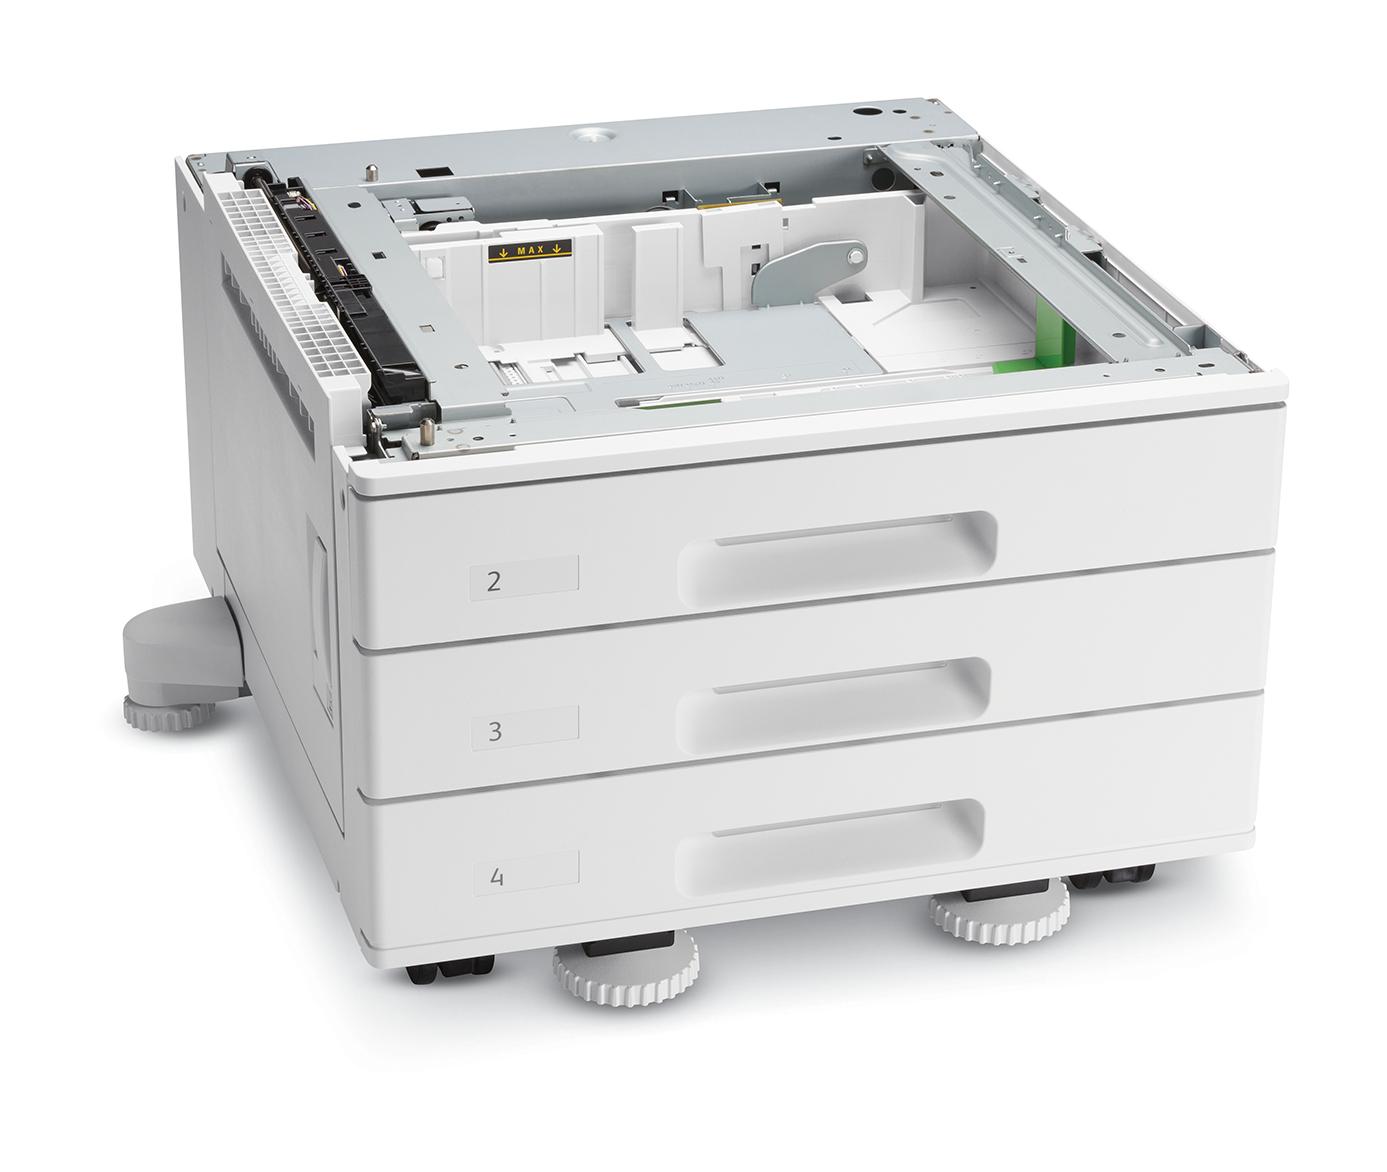 Xerox Modulo A Tre Vassoi 520 Fg A3